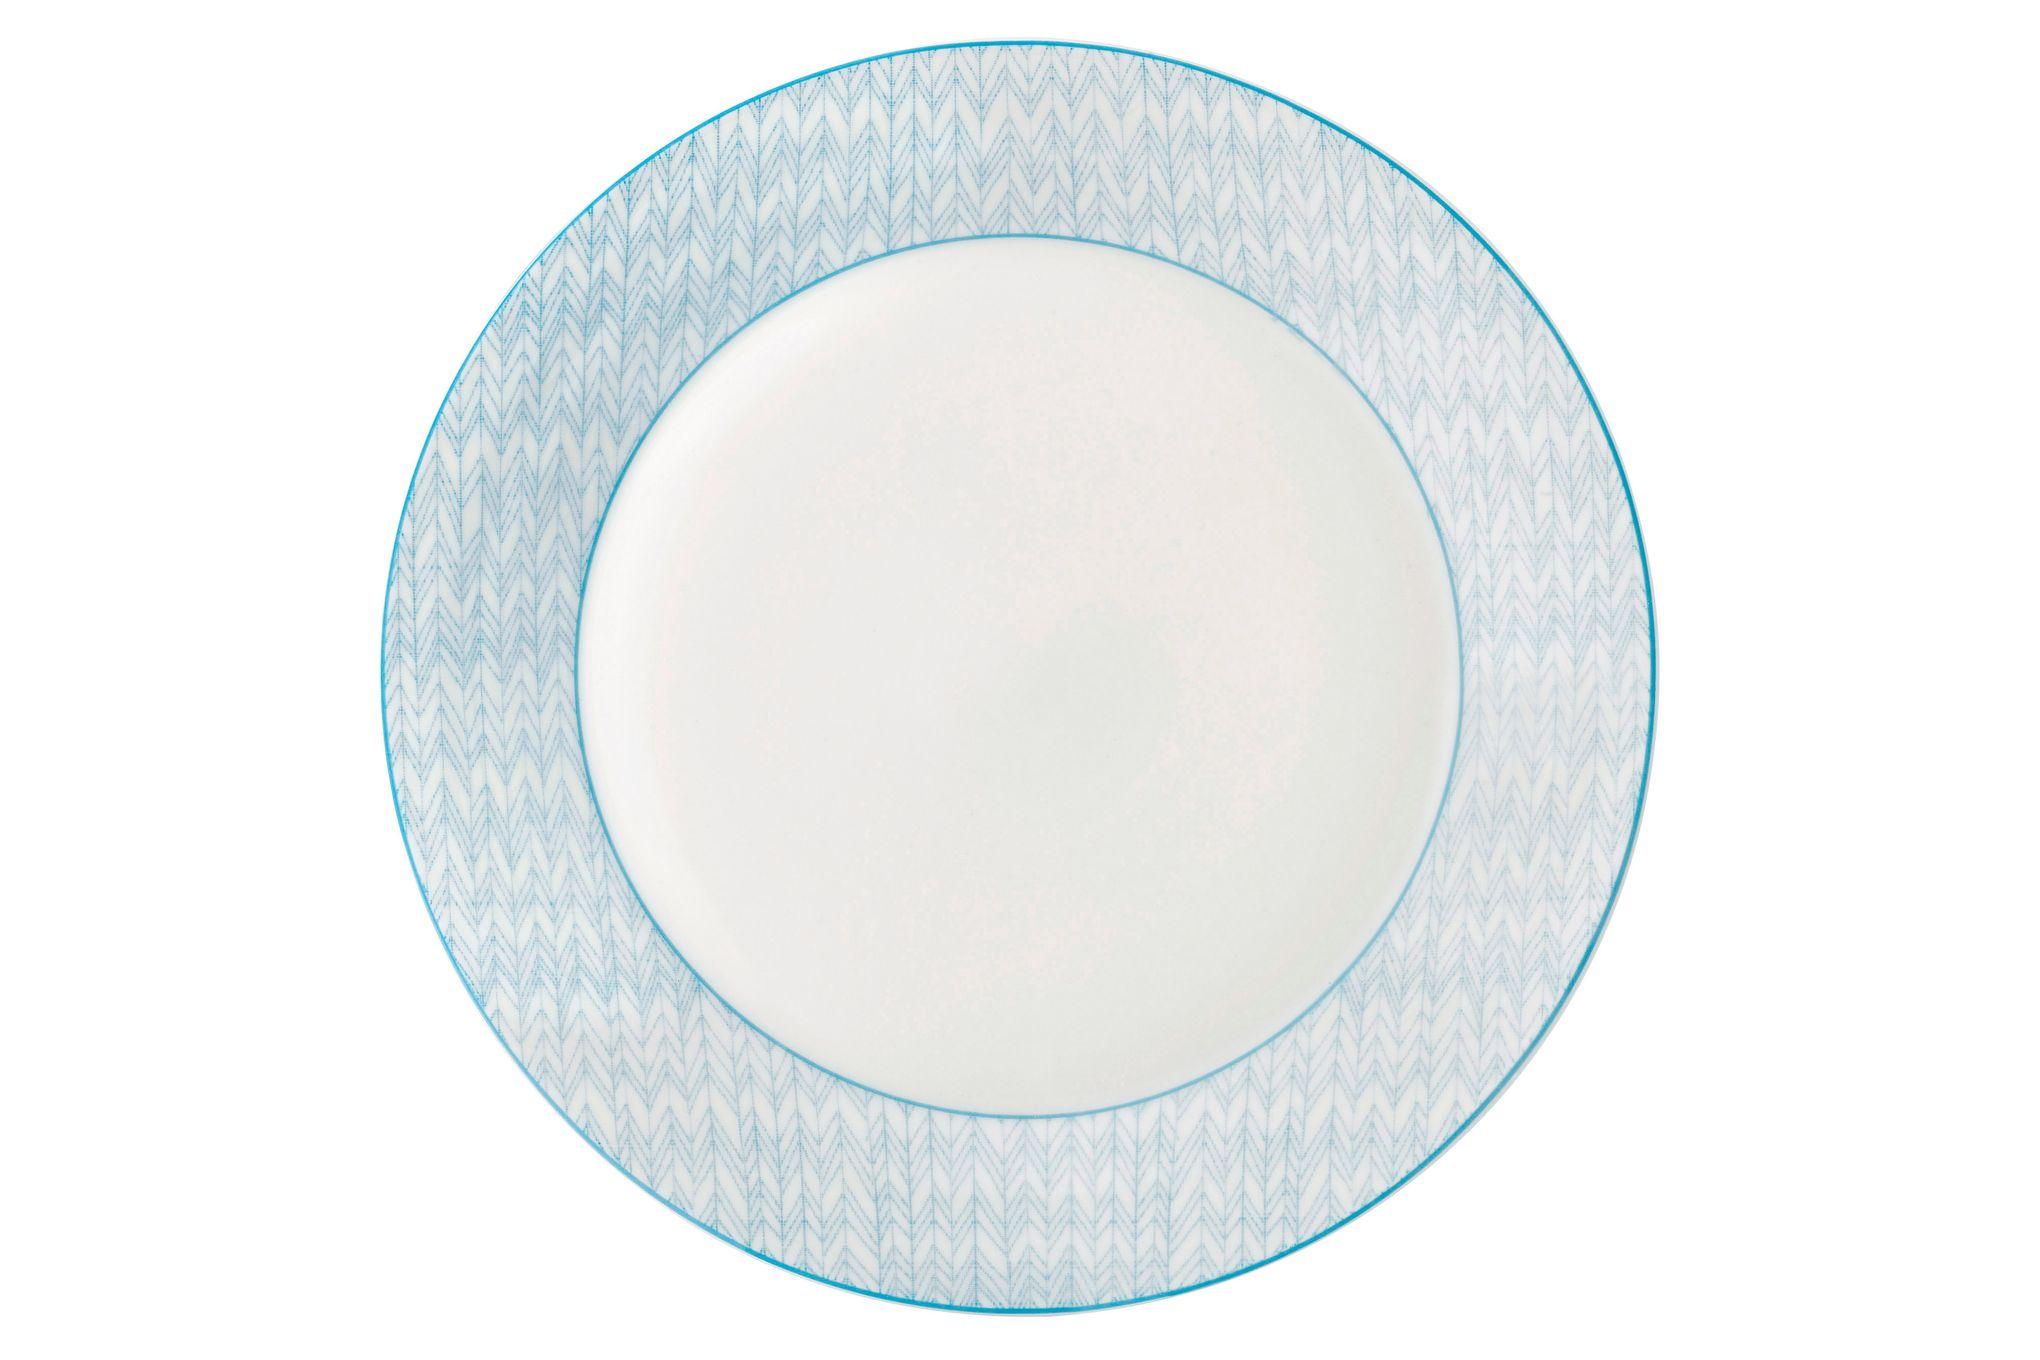 Royal Doulton Pastels Dinner Plate Herringbone 28cm thumb 1